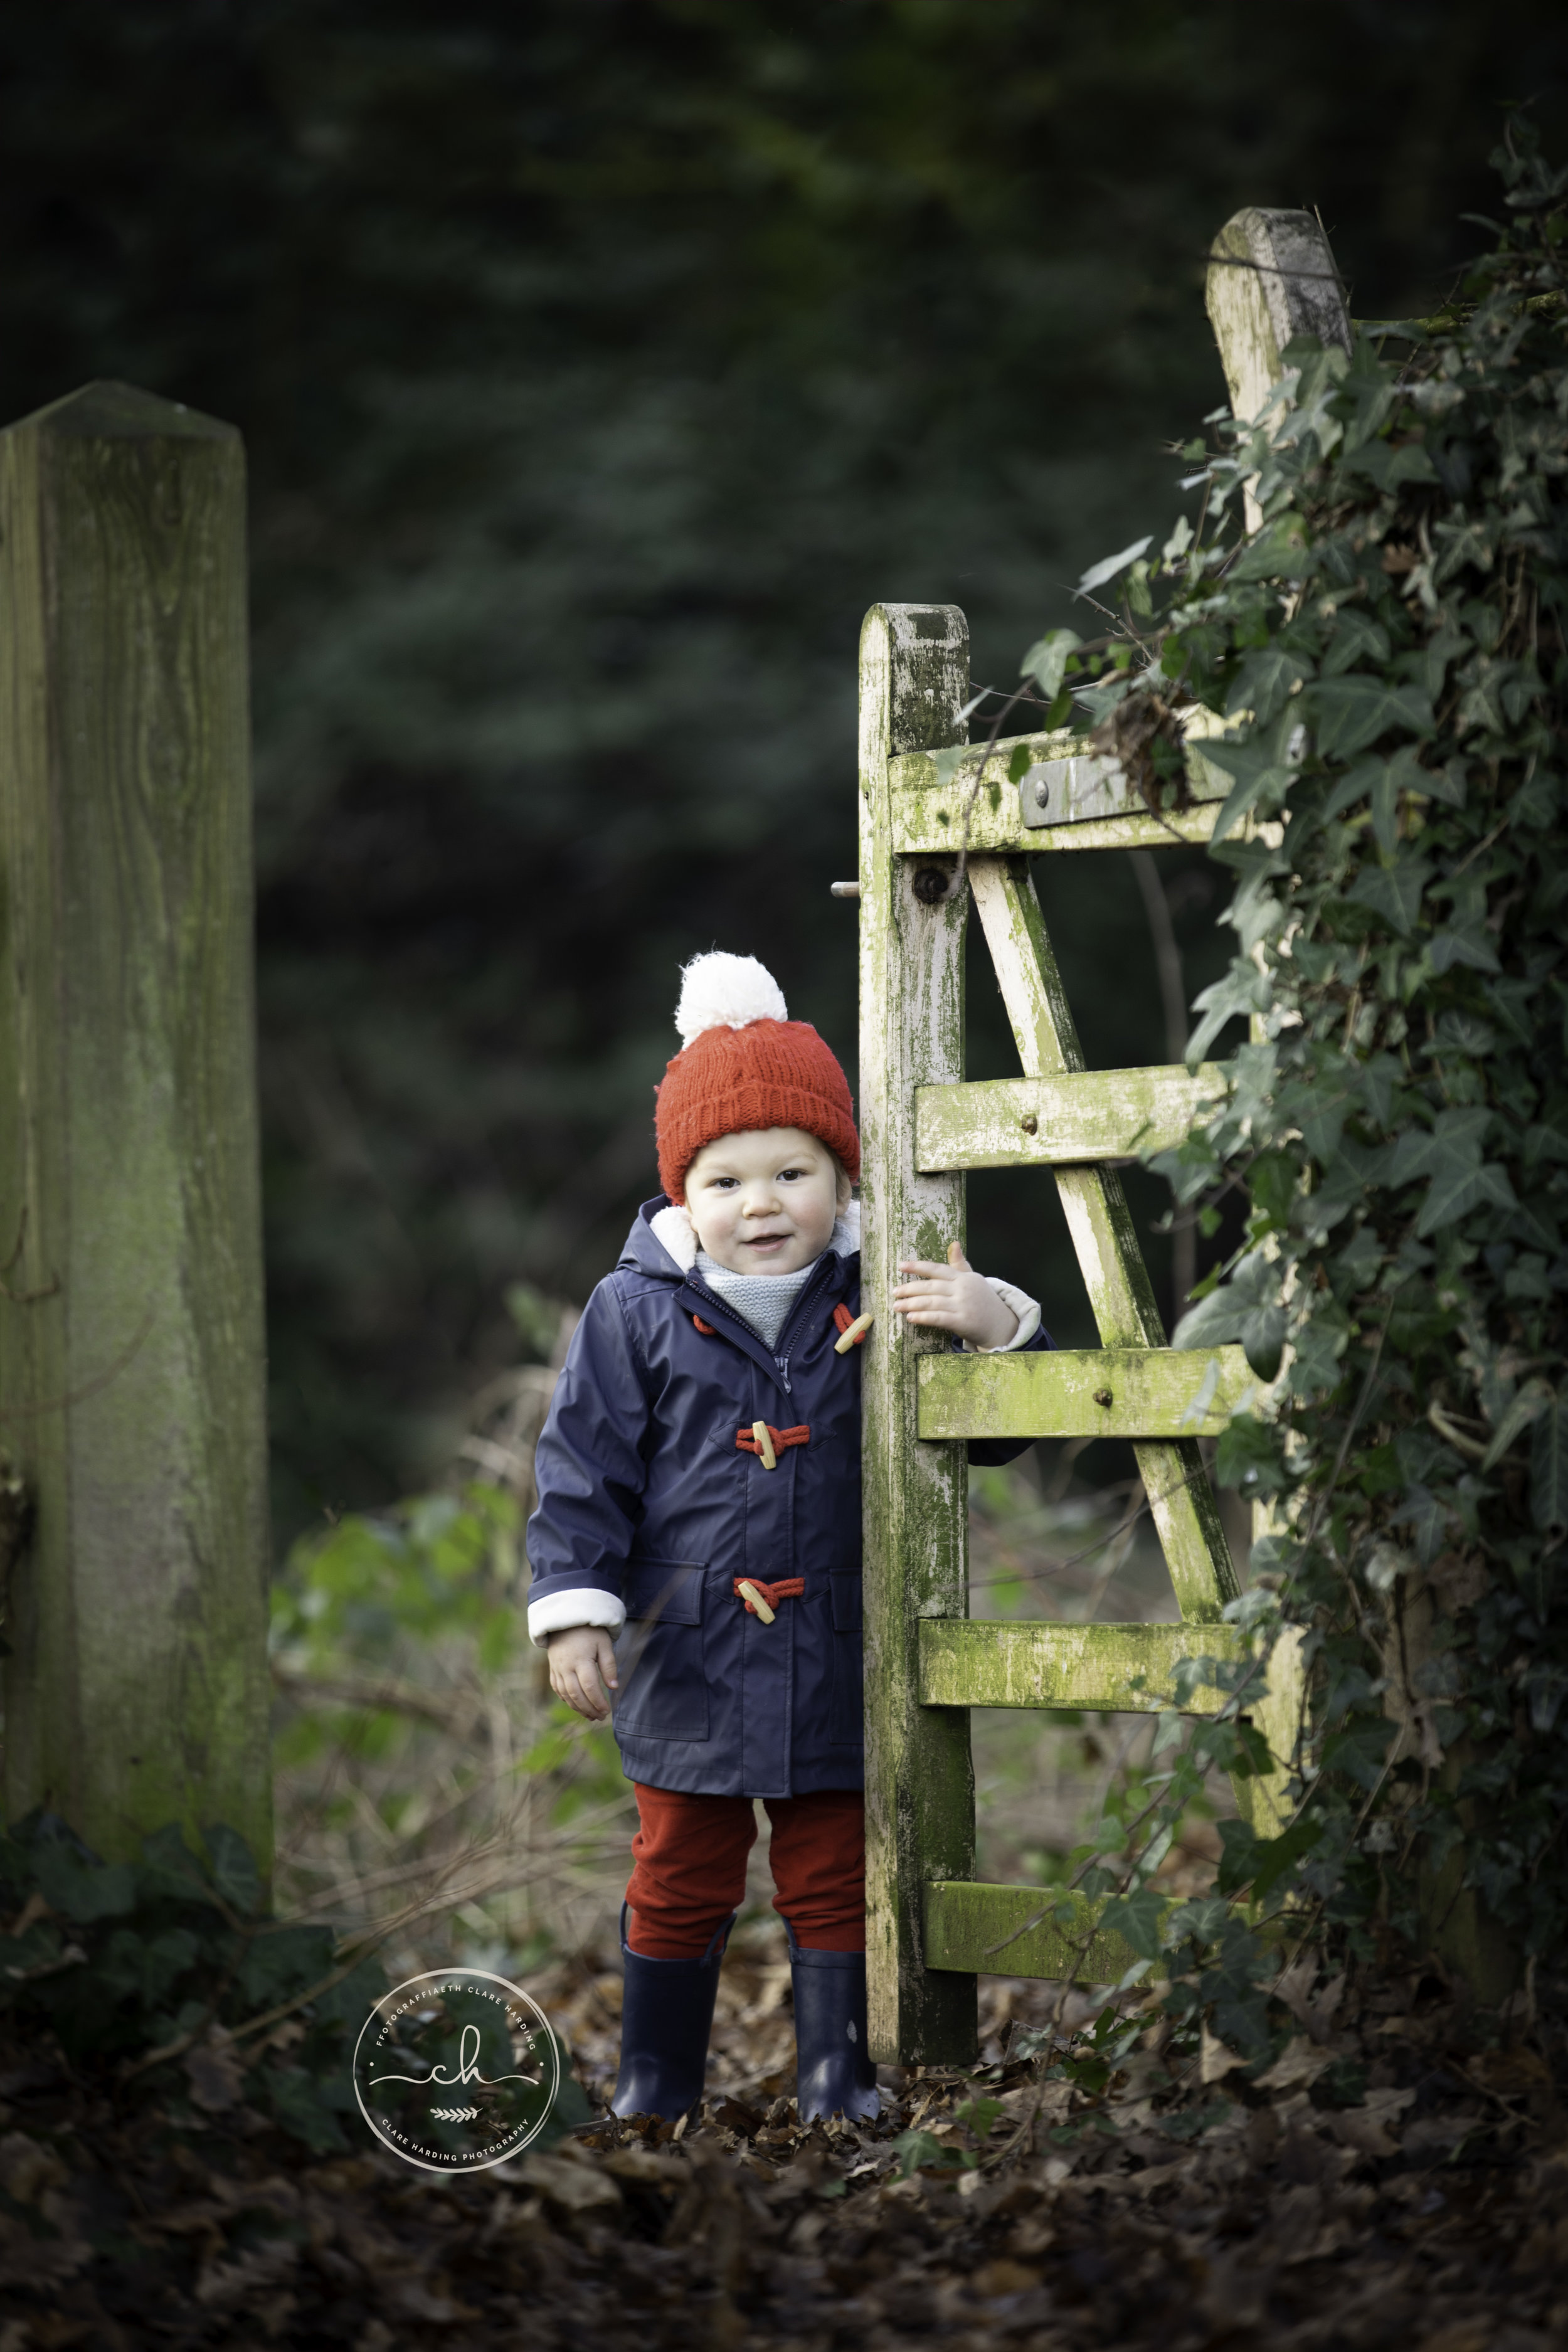 child-family-photographer-cardiff.jpg